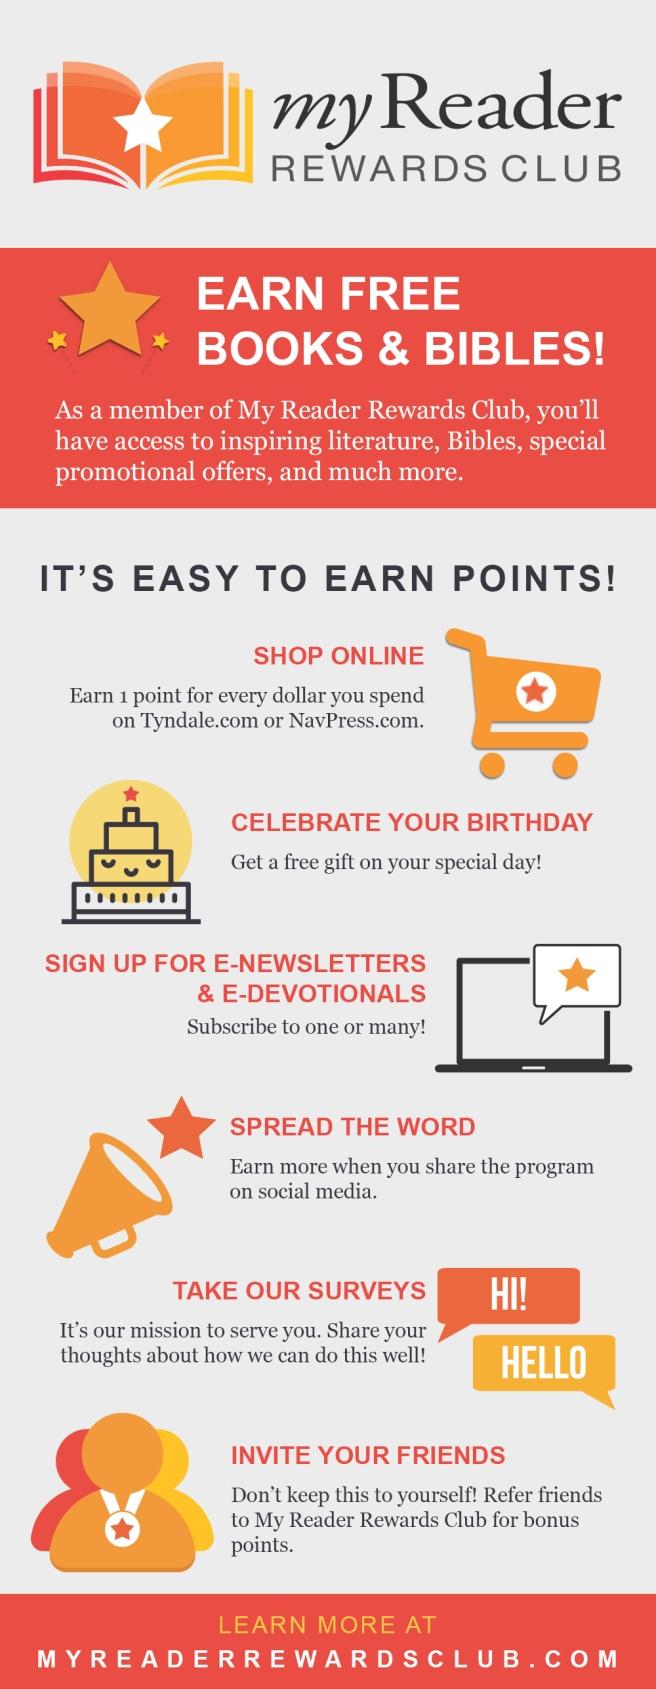 readerrewards_infographic_v2-1